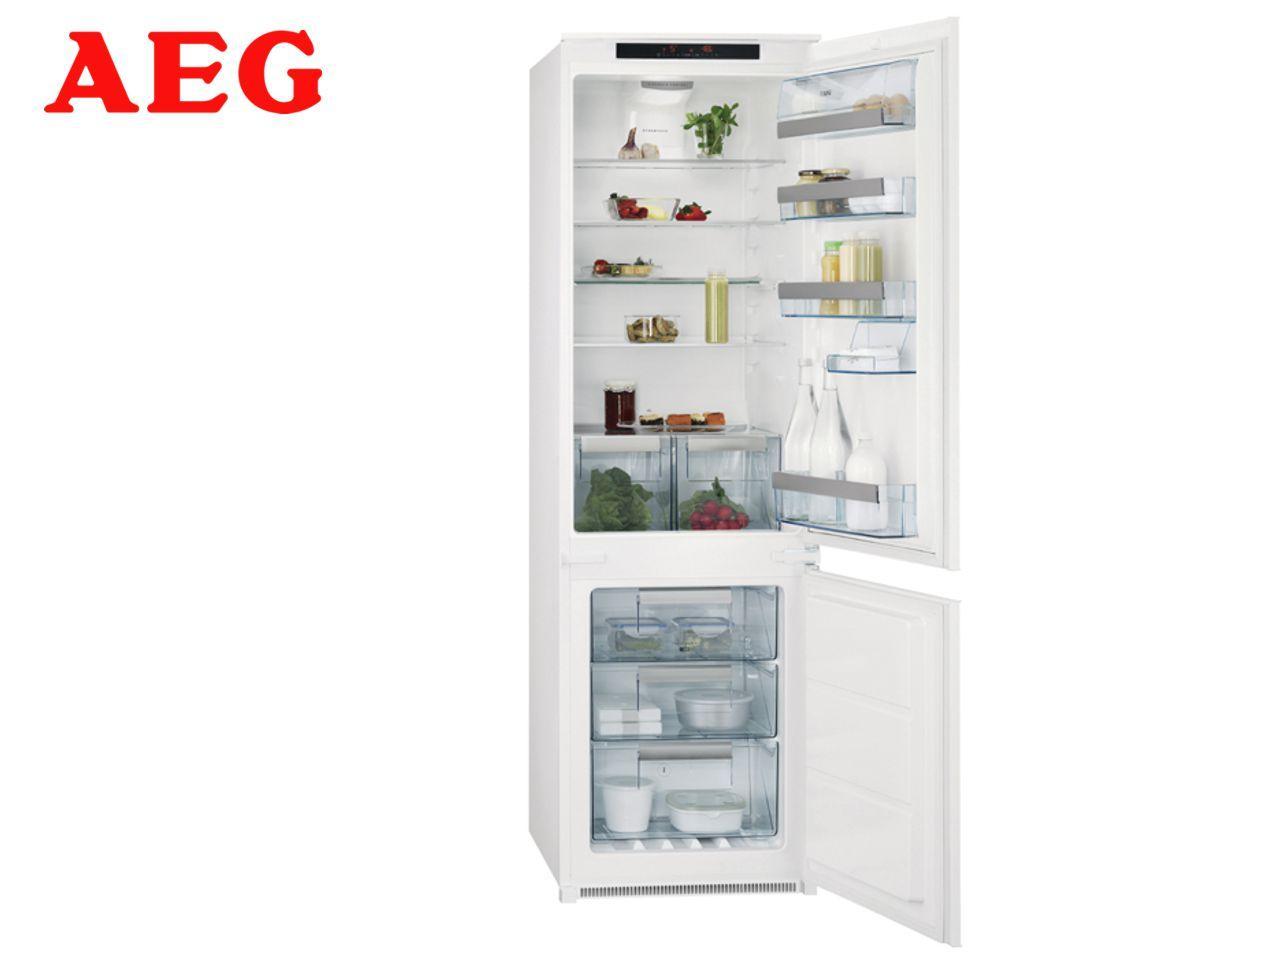 AEG SCT81800S1